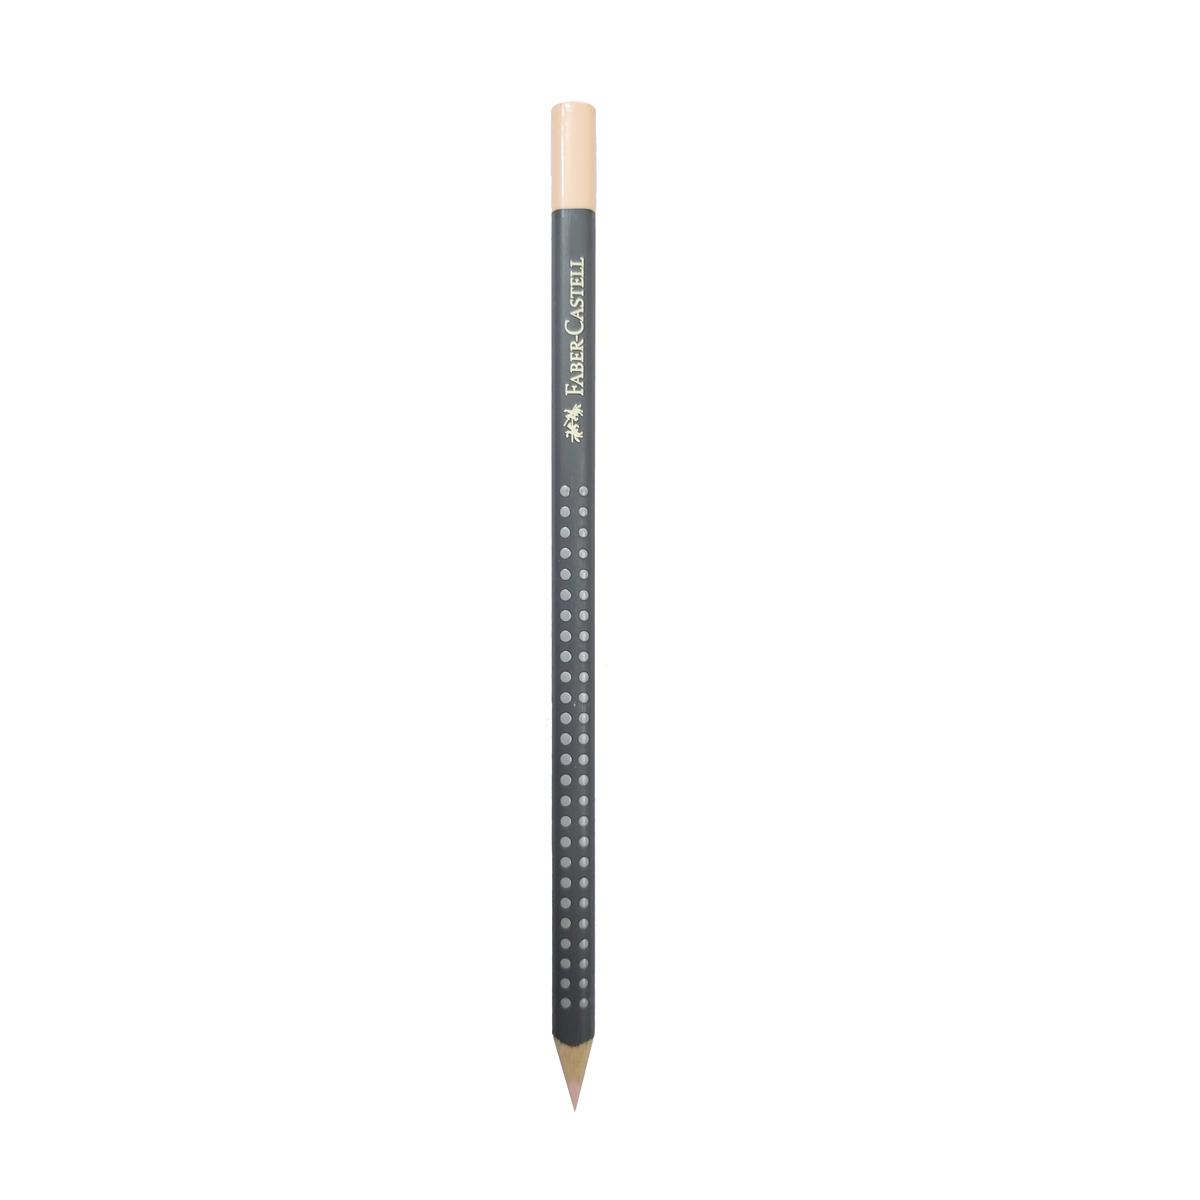 مداد رنگی فابر کاستل مدل آرت گریپ کد 132